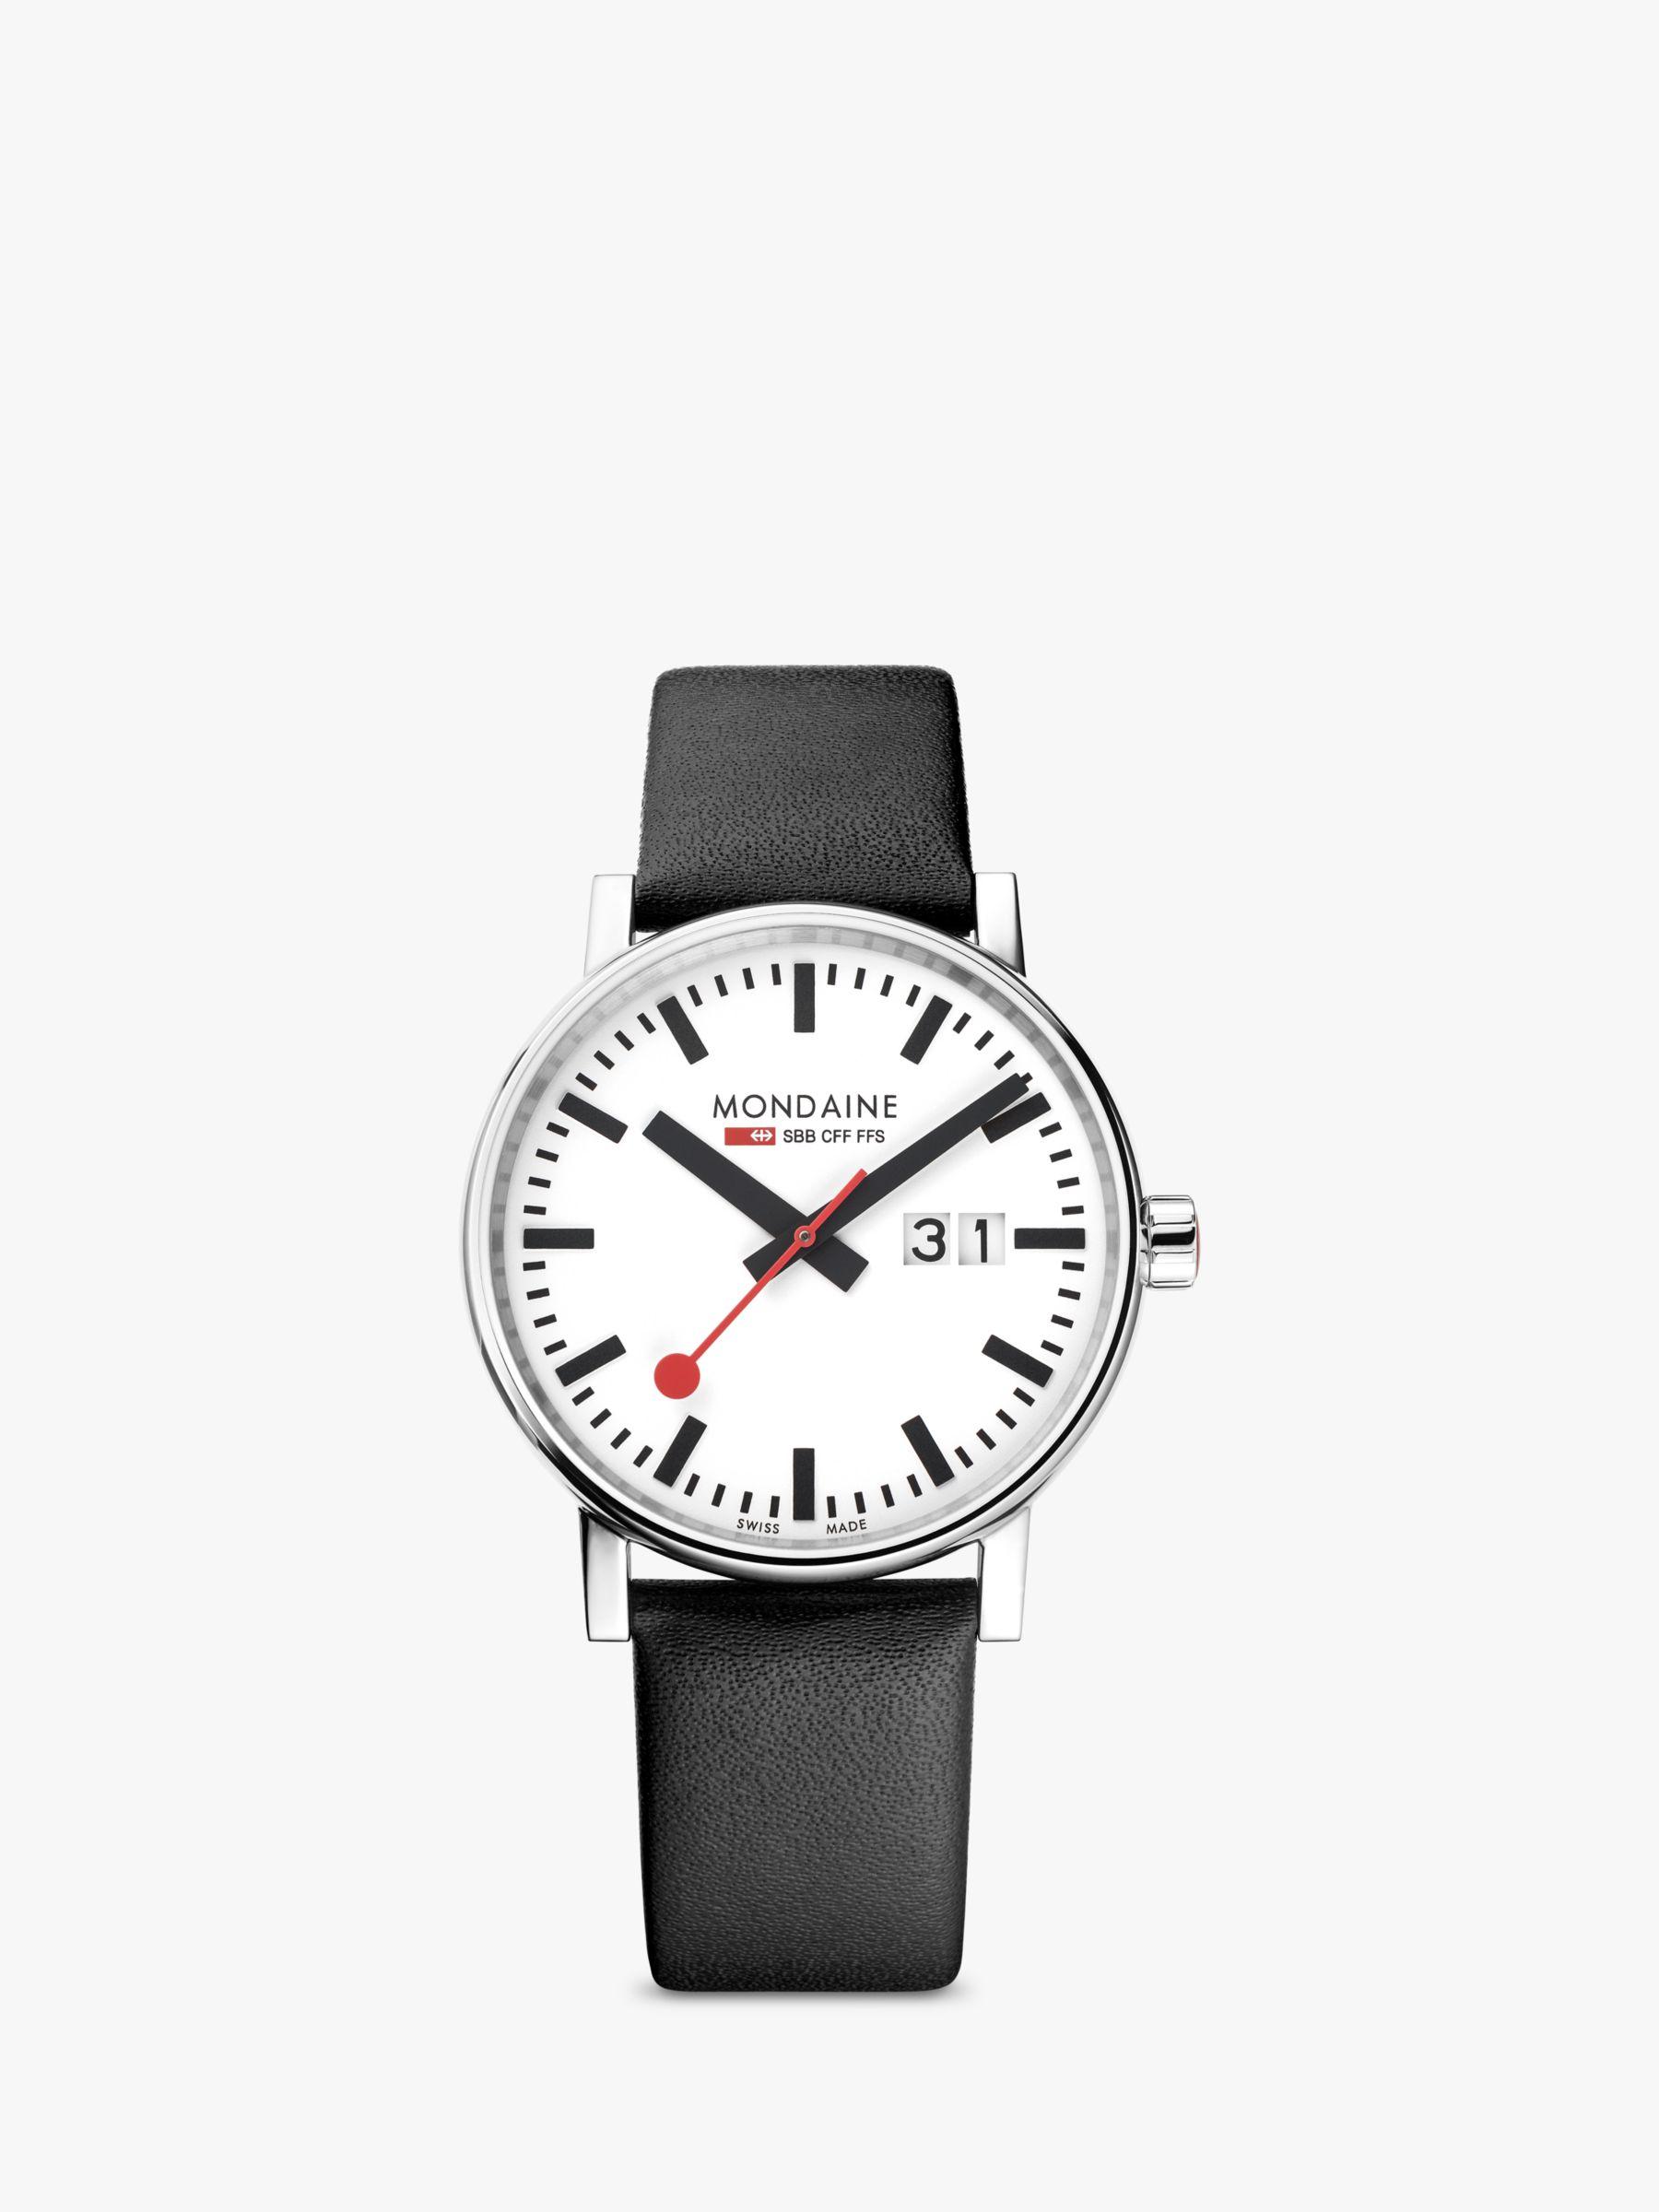 Mondaine Mondaine MSE.40210.LB Unisex Evo 2 Date Leather Strap Watch, Black/White